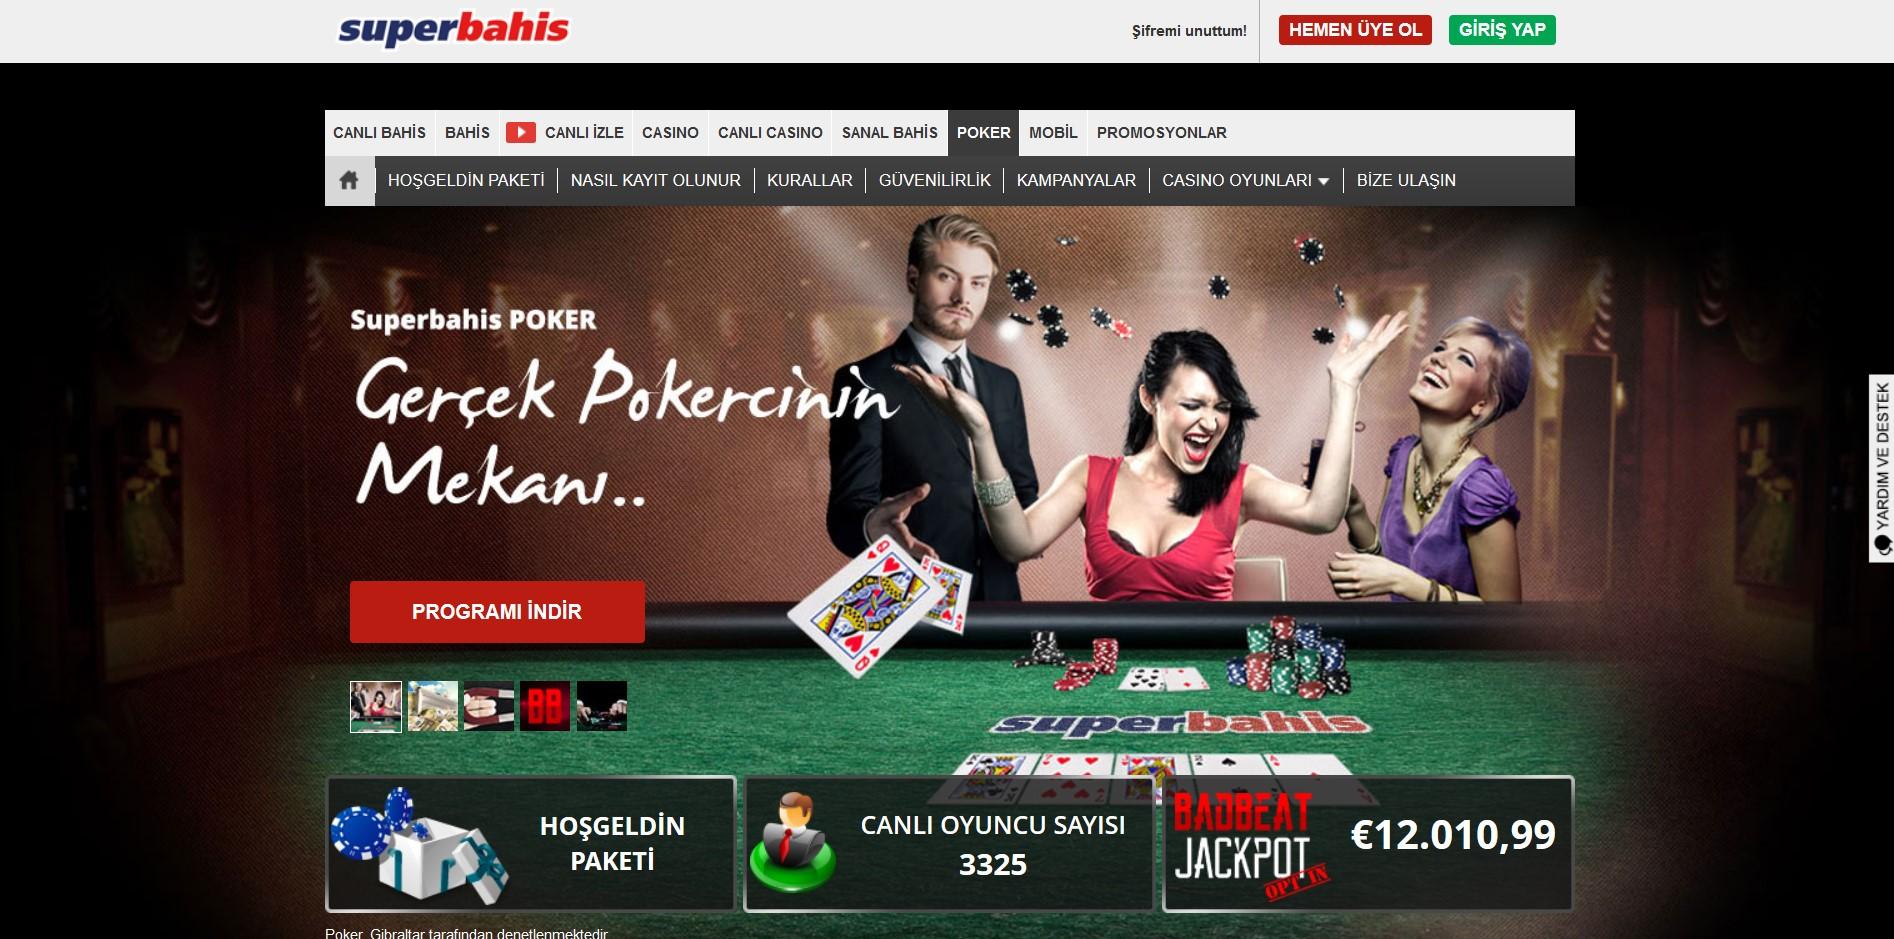 Süperbahis Canlı Bahis ve Canlı Casino